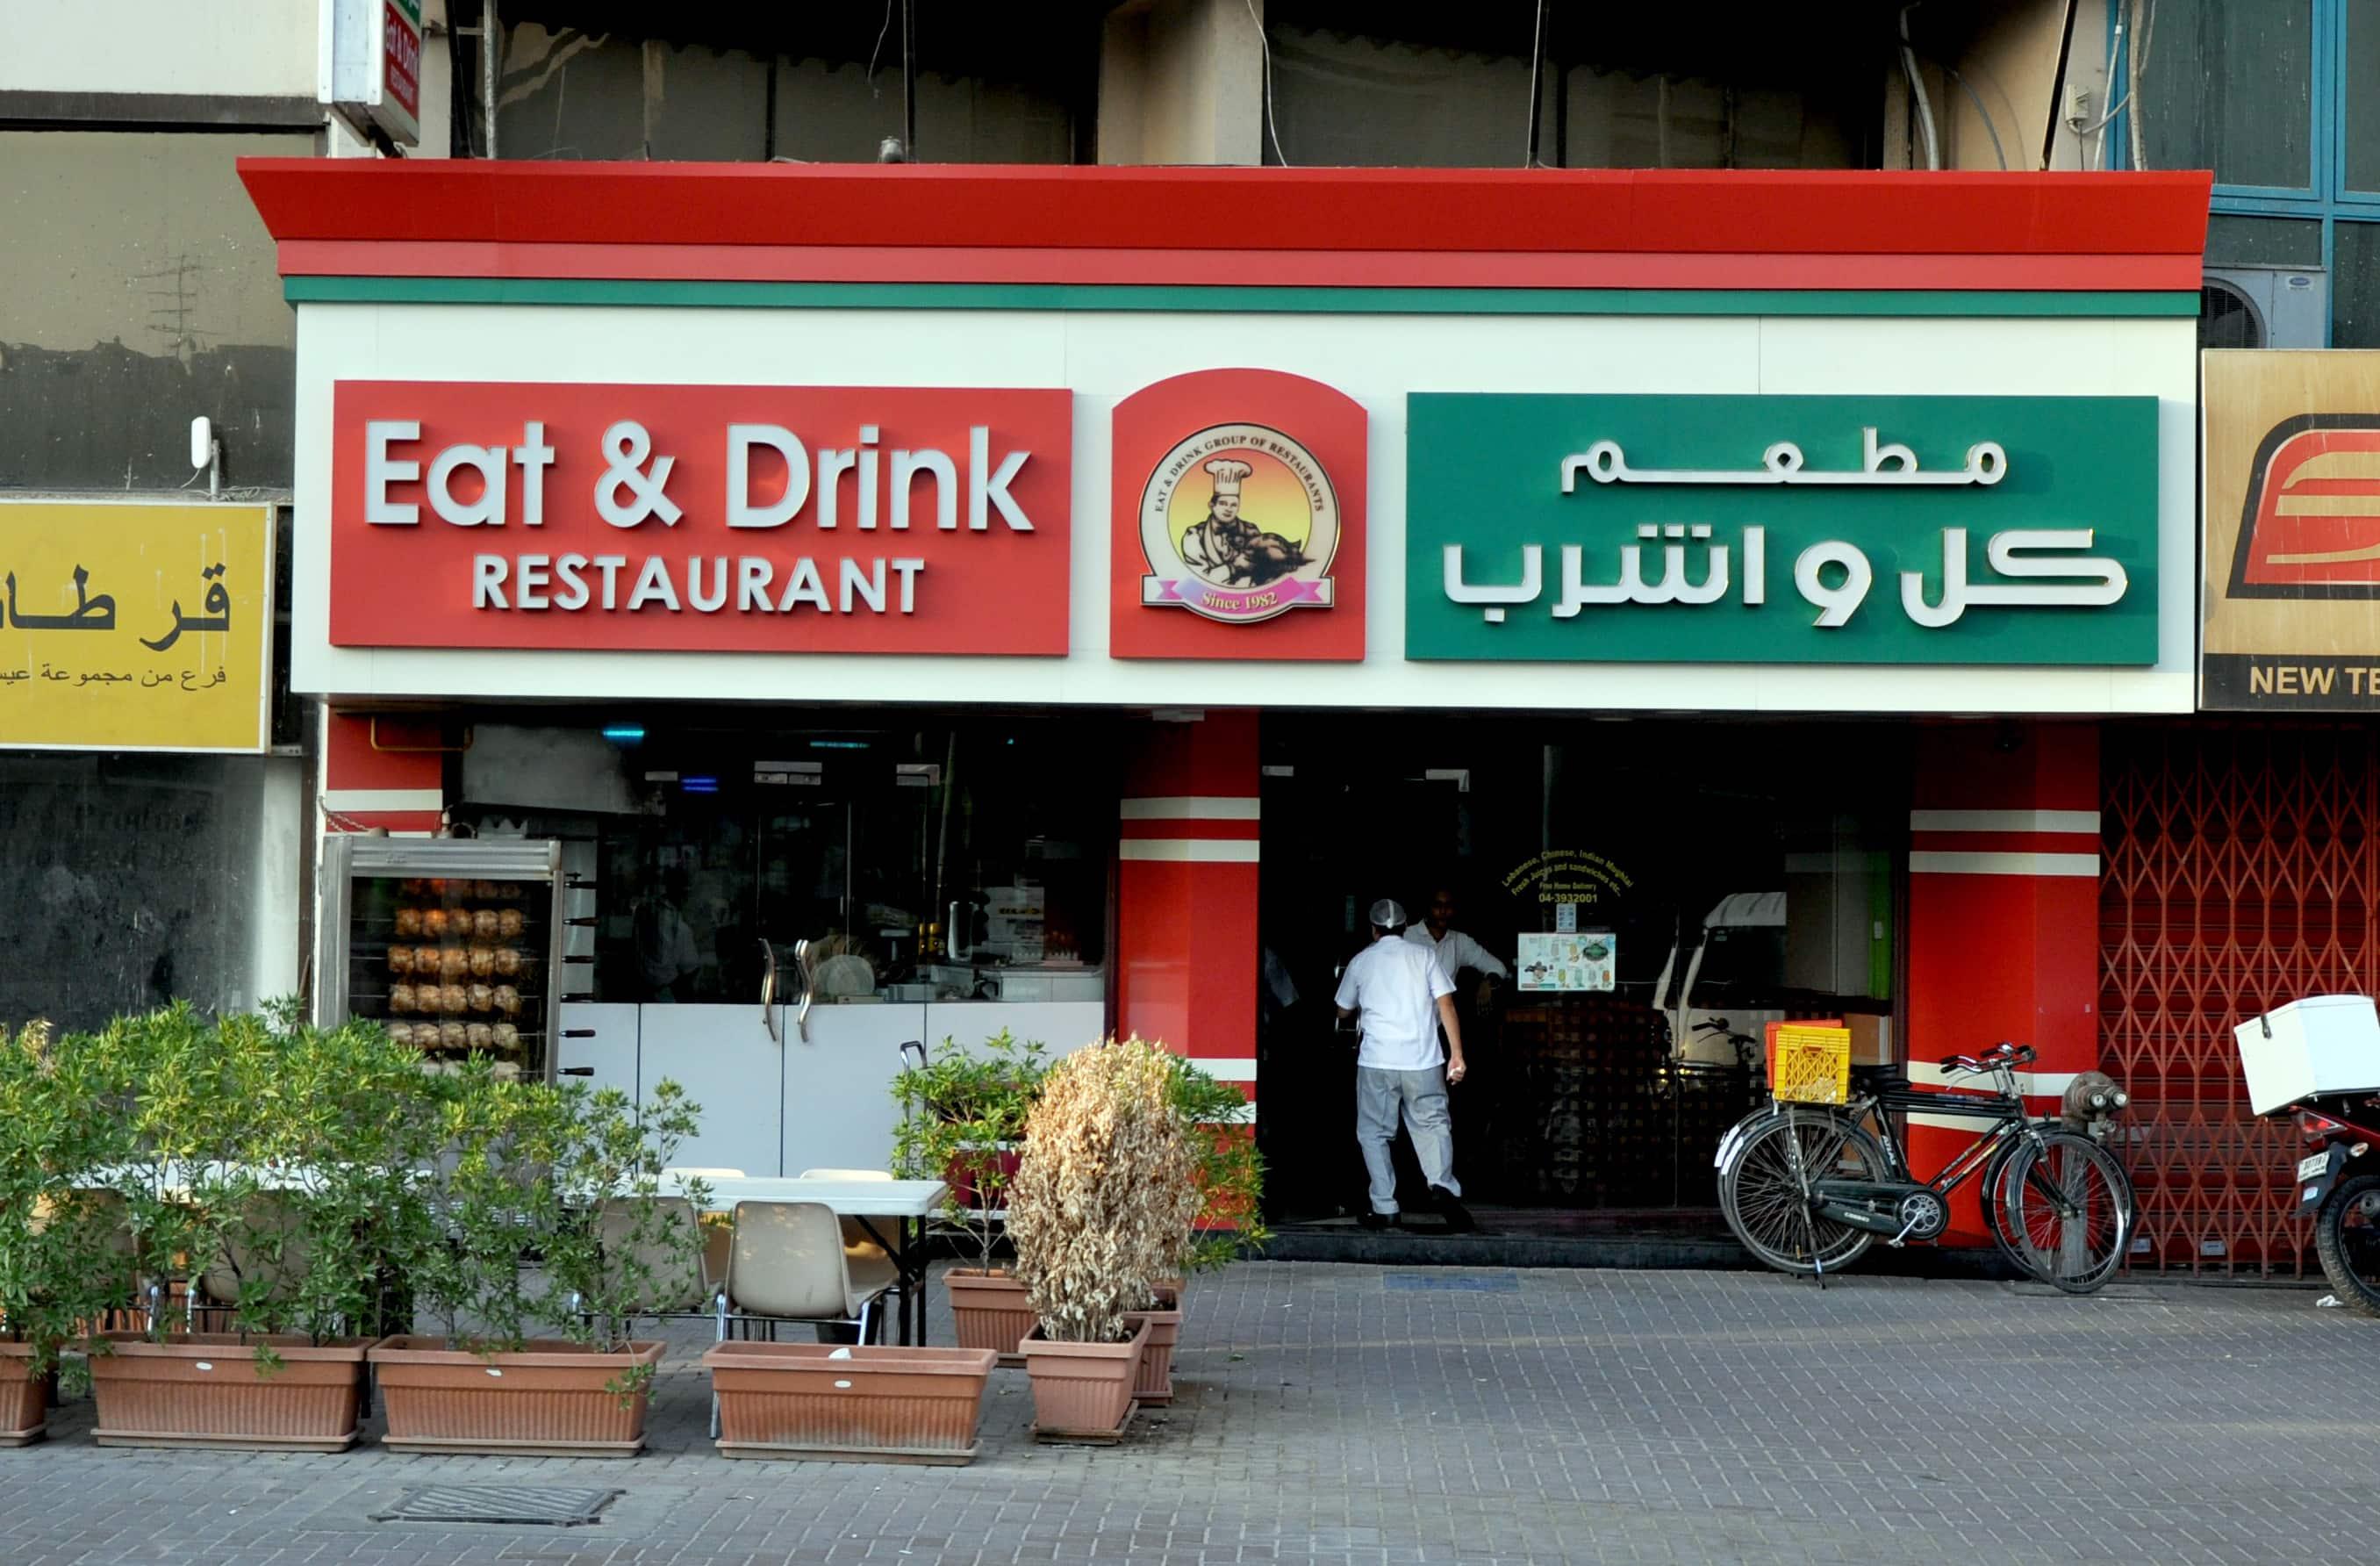 Dubai's Eat &amp